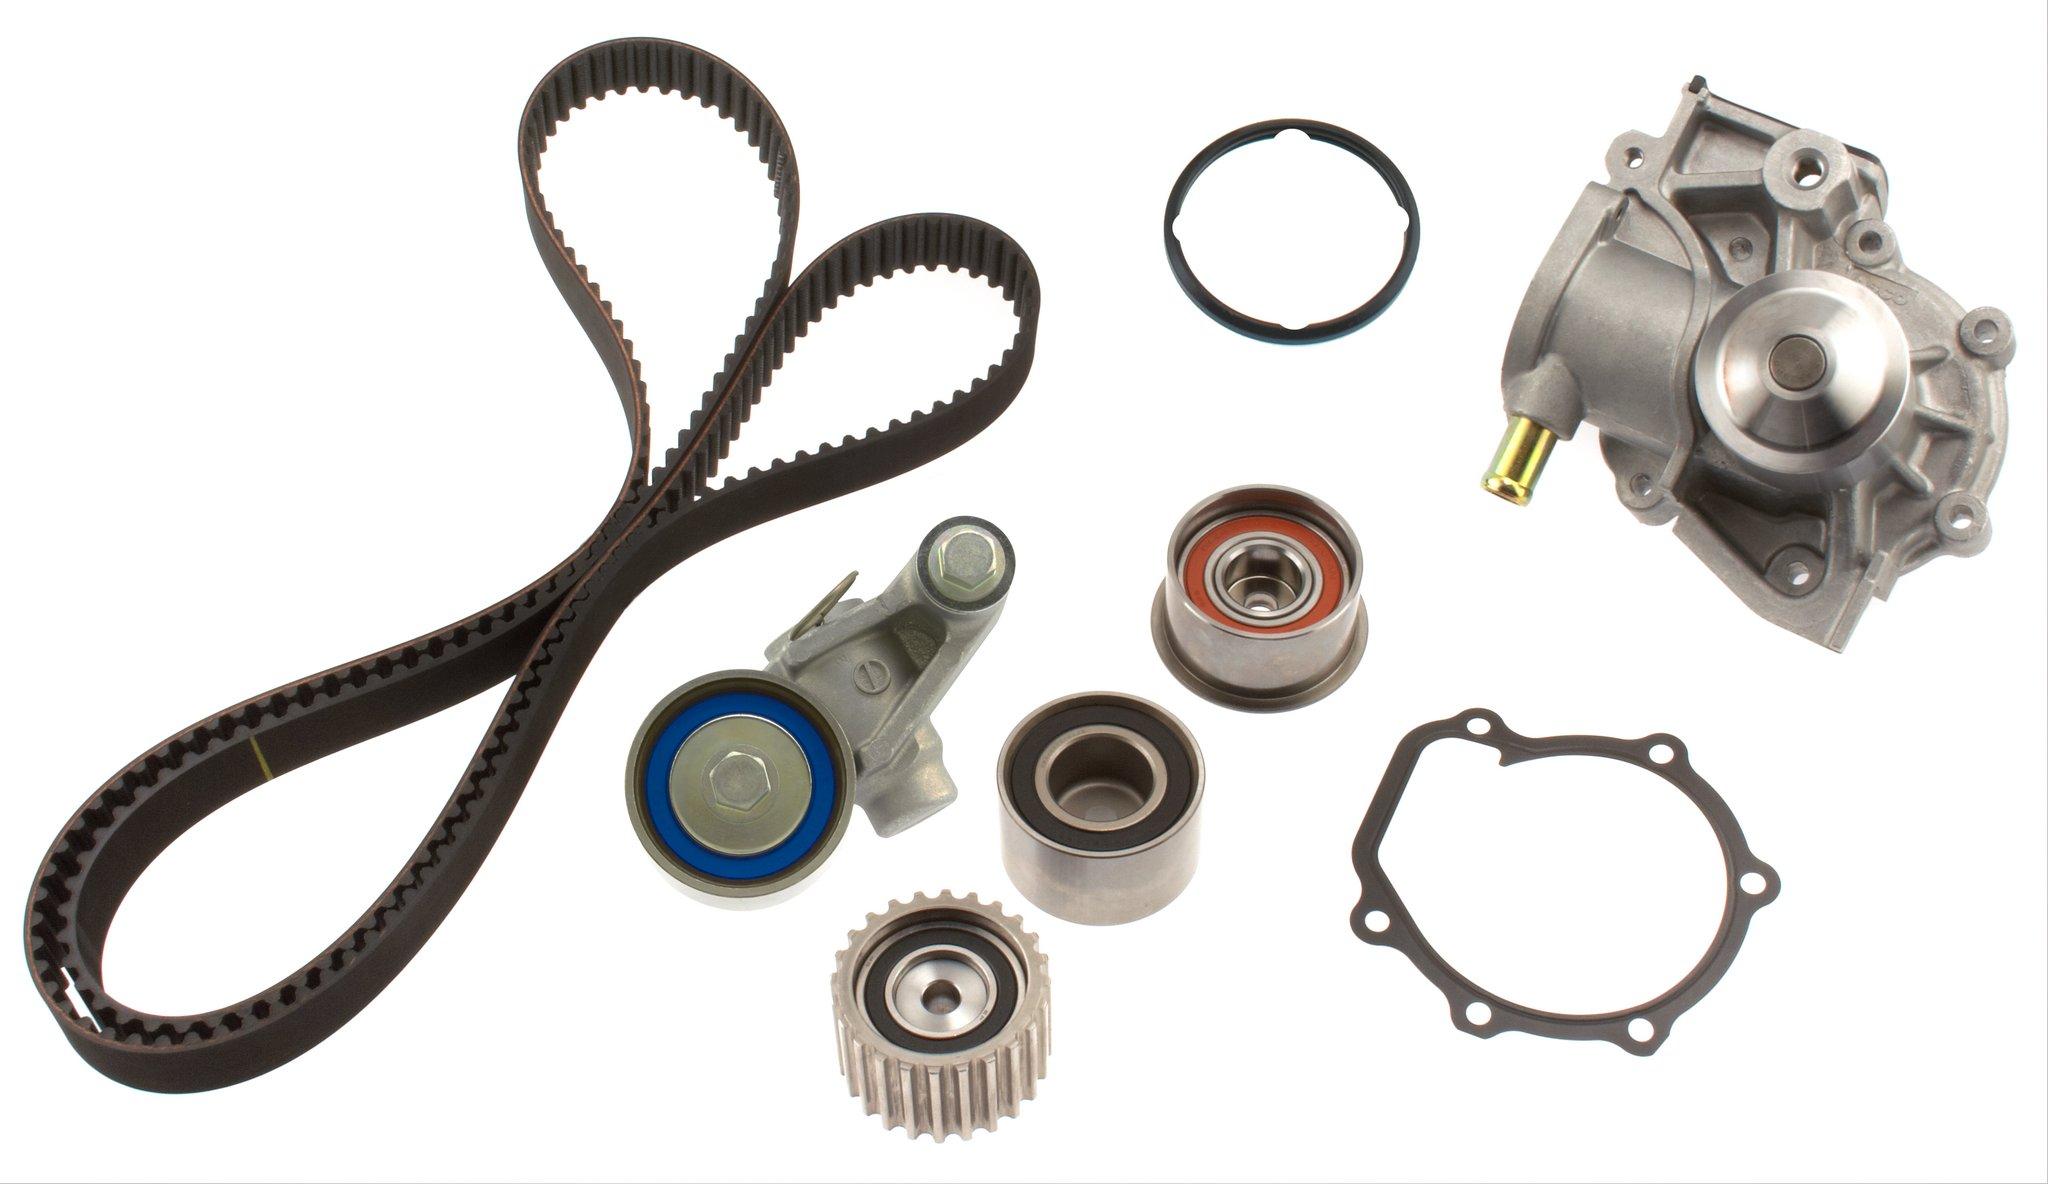 2005 Saab 9 2x Engine Timing Belt Kit With Water Pump A8 Tkf 001